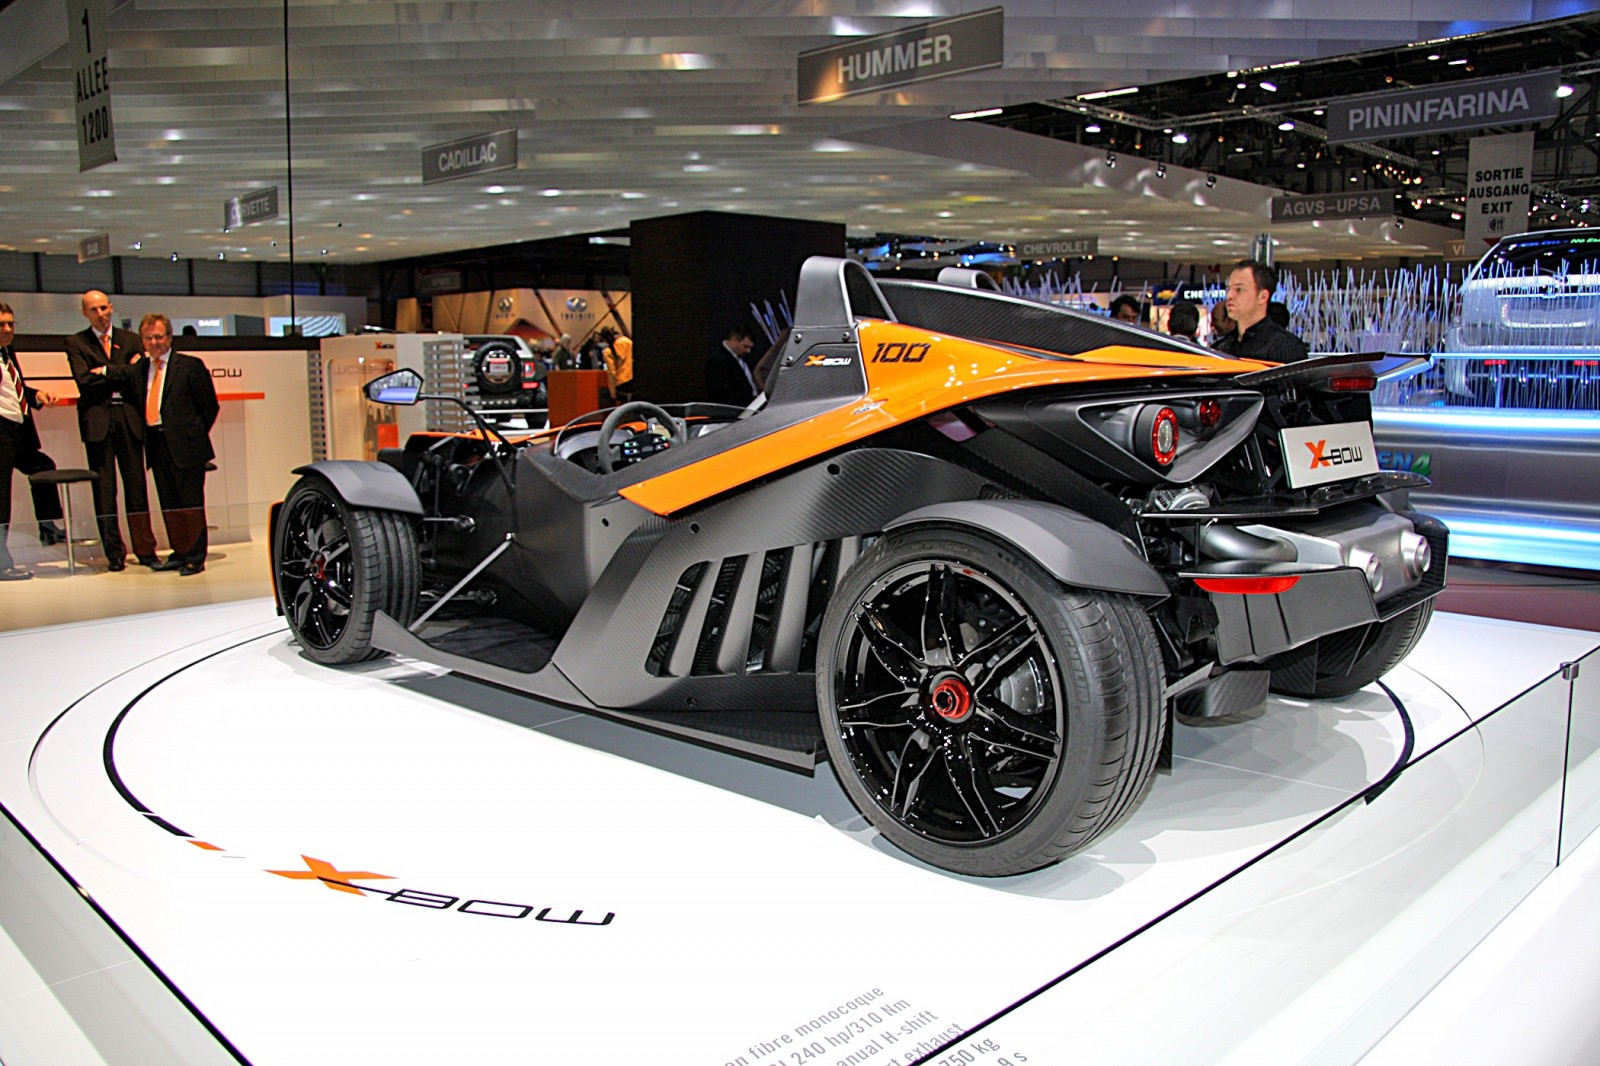 2015 KTM X-Bow RR 4